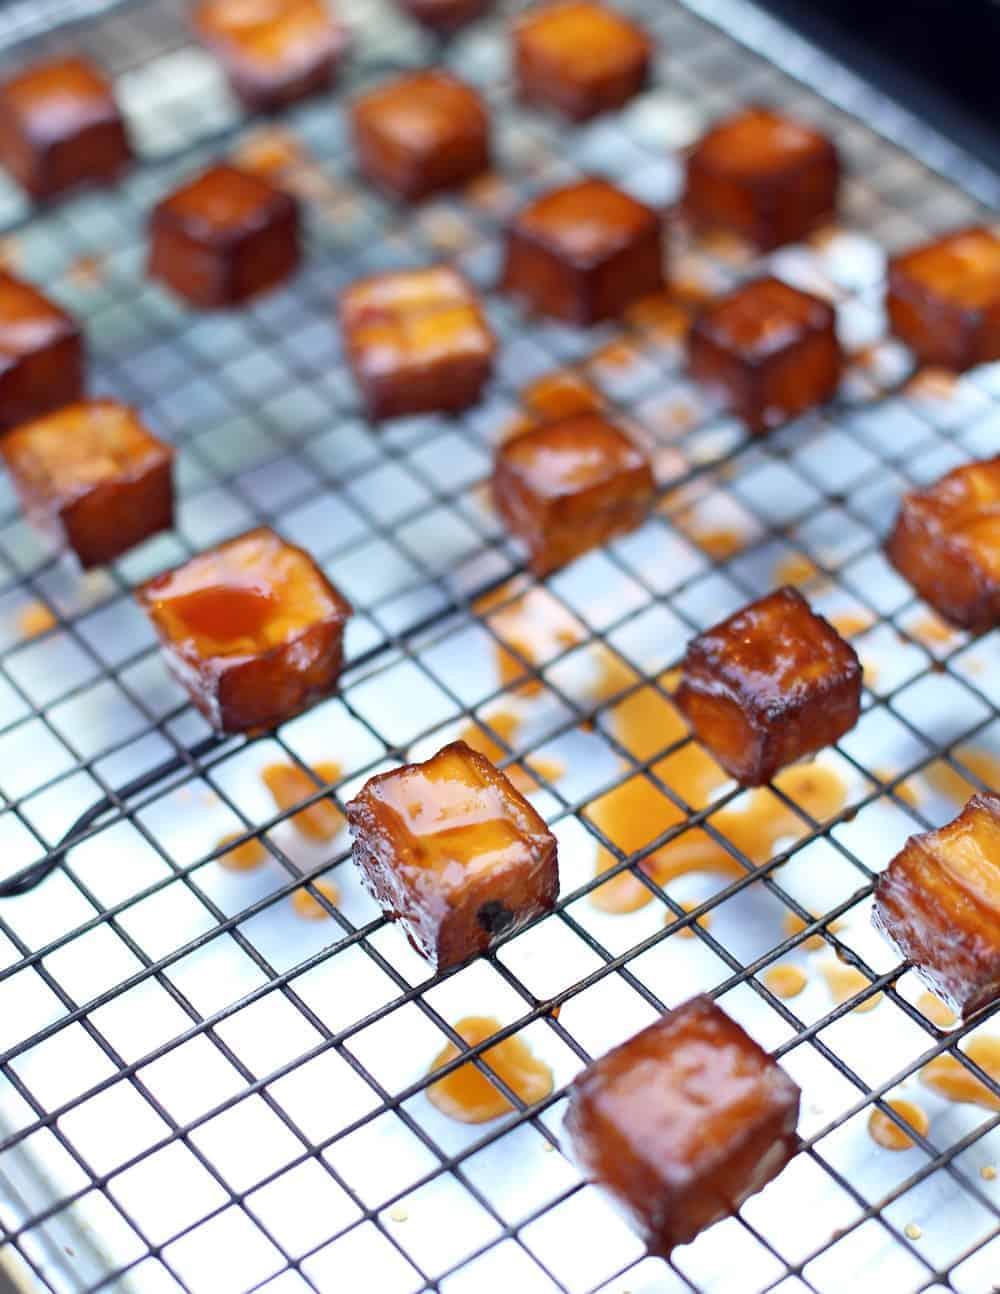 Smoking tofu on the outdoor grill or smoker